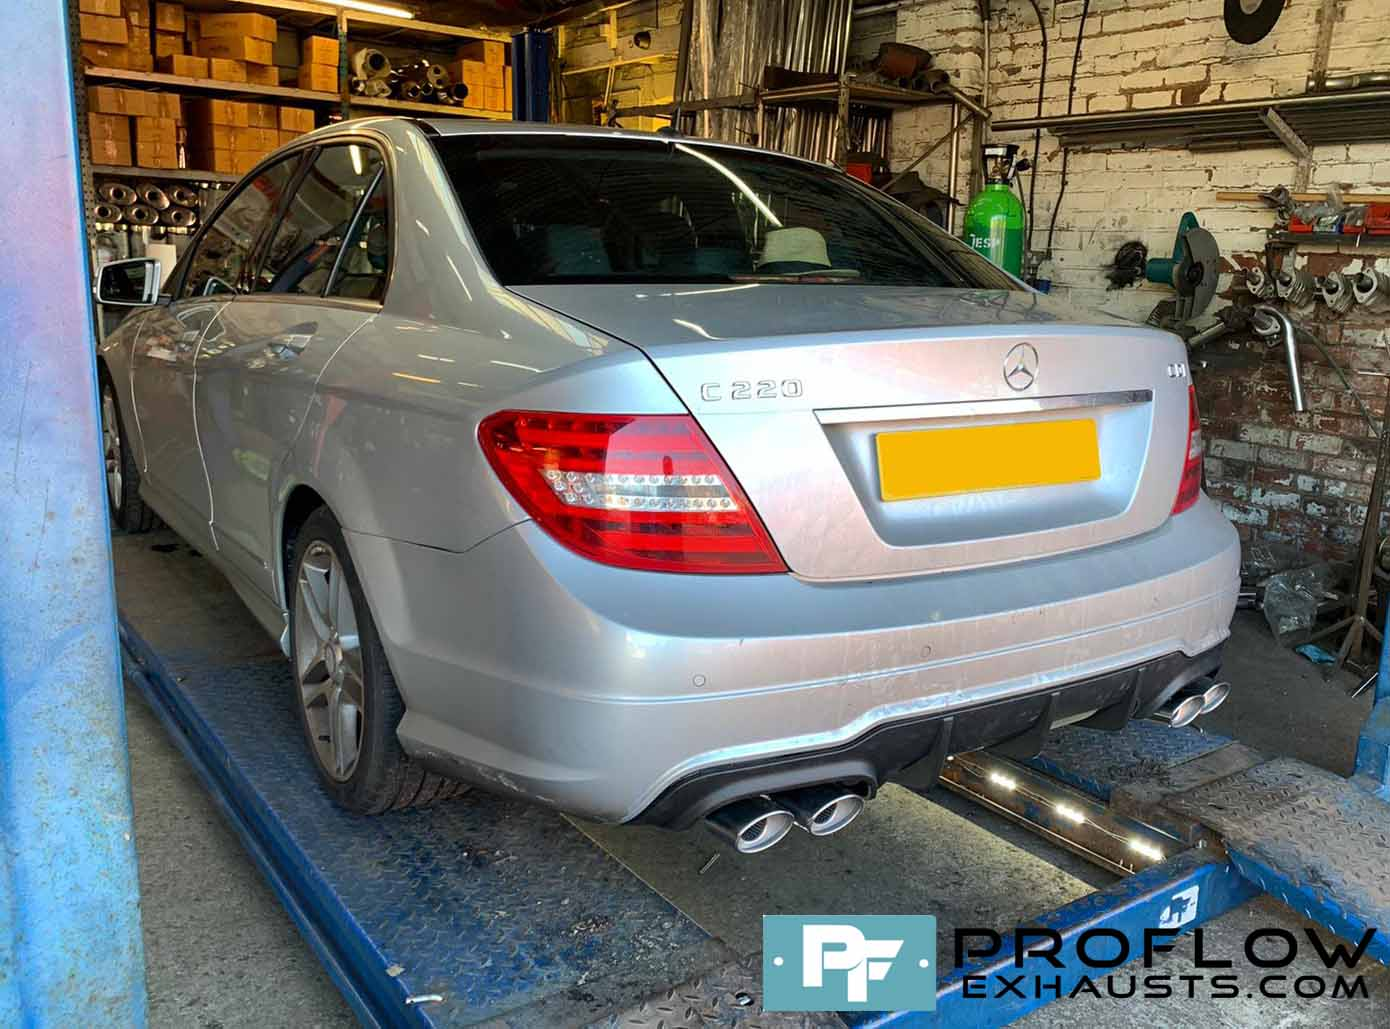 Proflow Custom Built Exhaust Stainless Steel for Mercedes C220